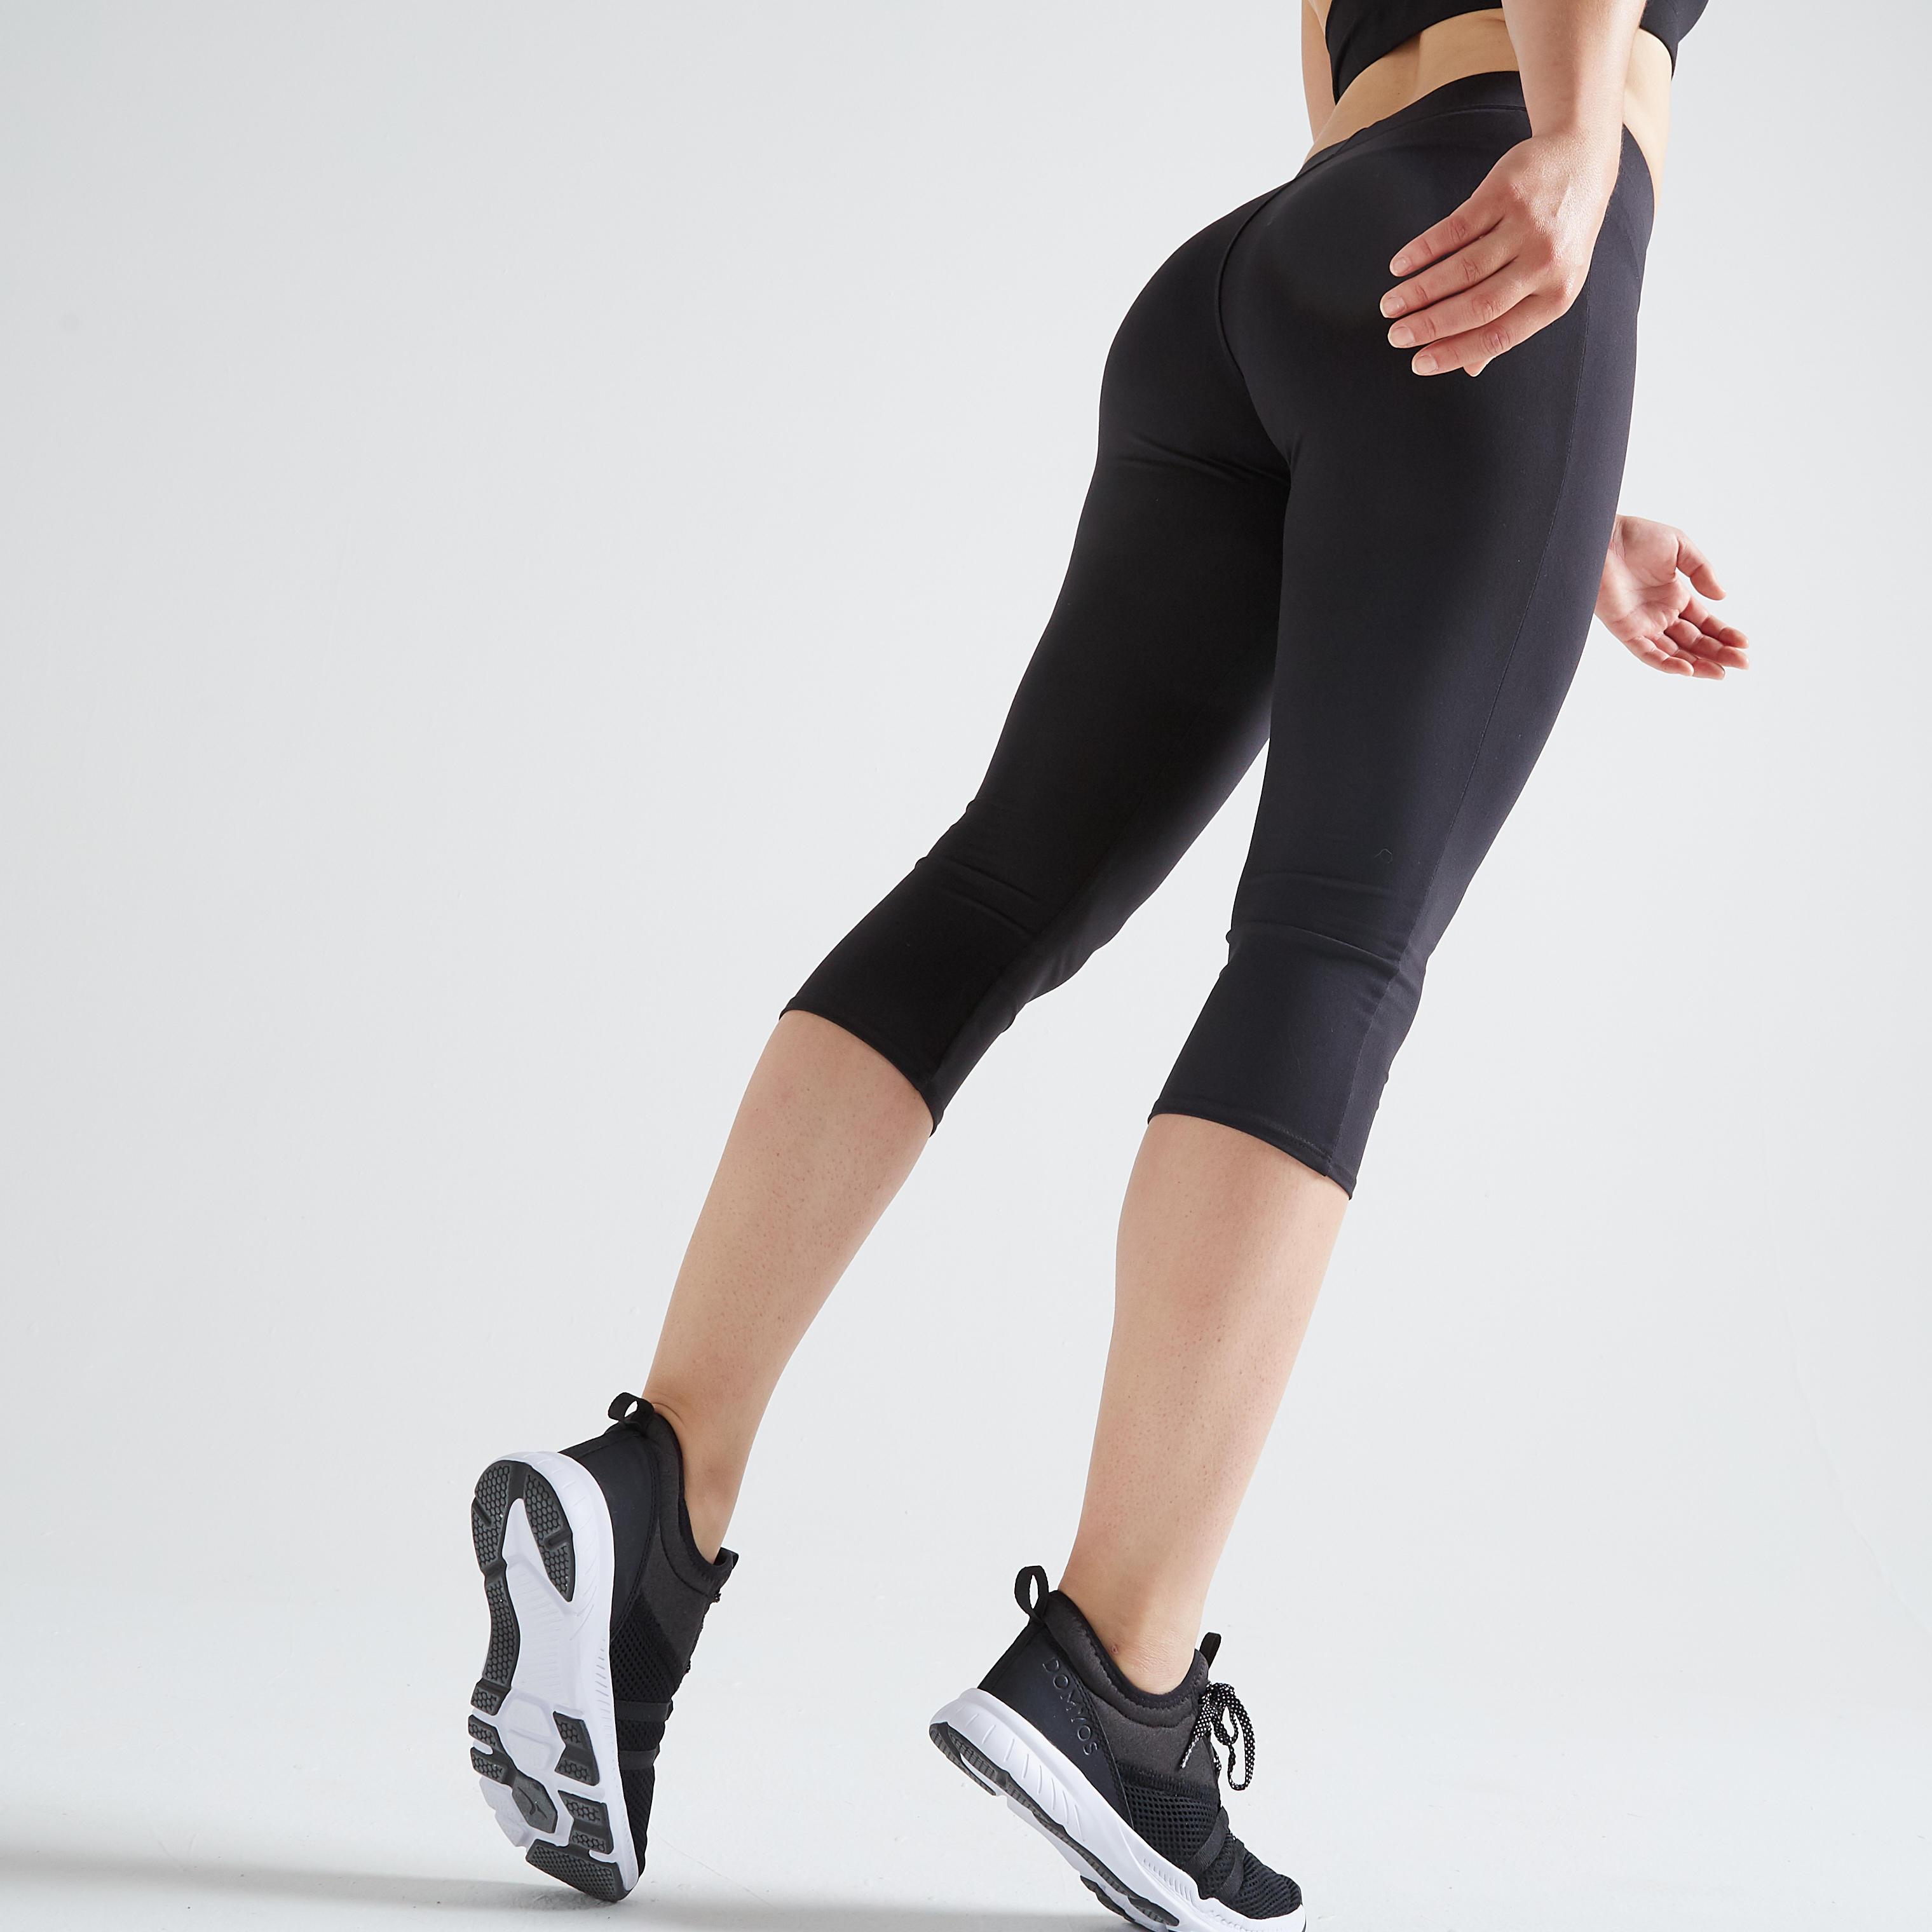 Colanți Fitness Cardio 100 imagine